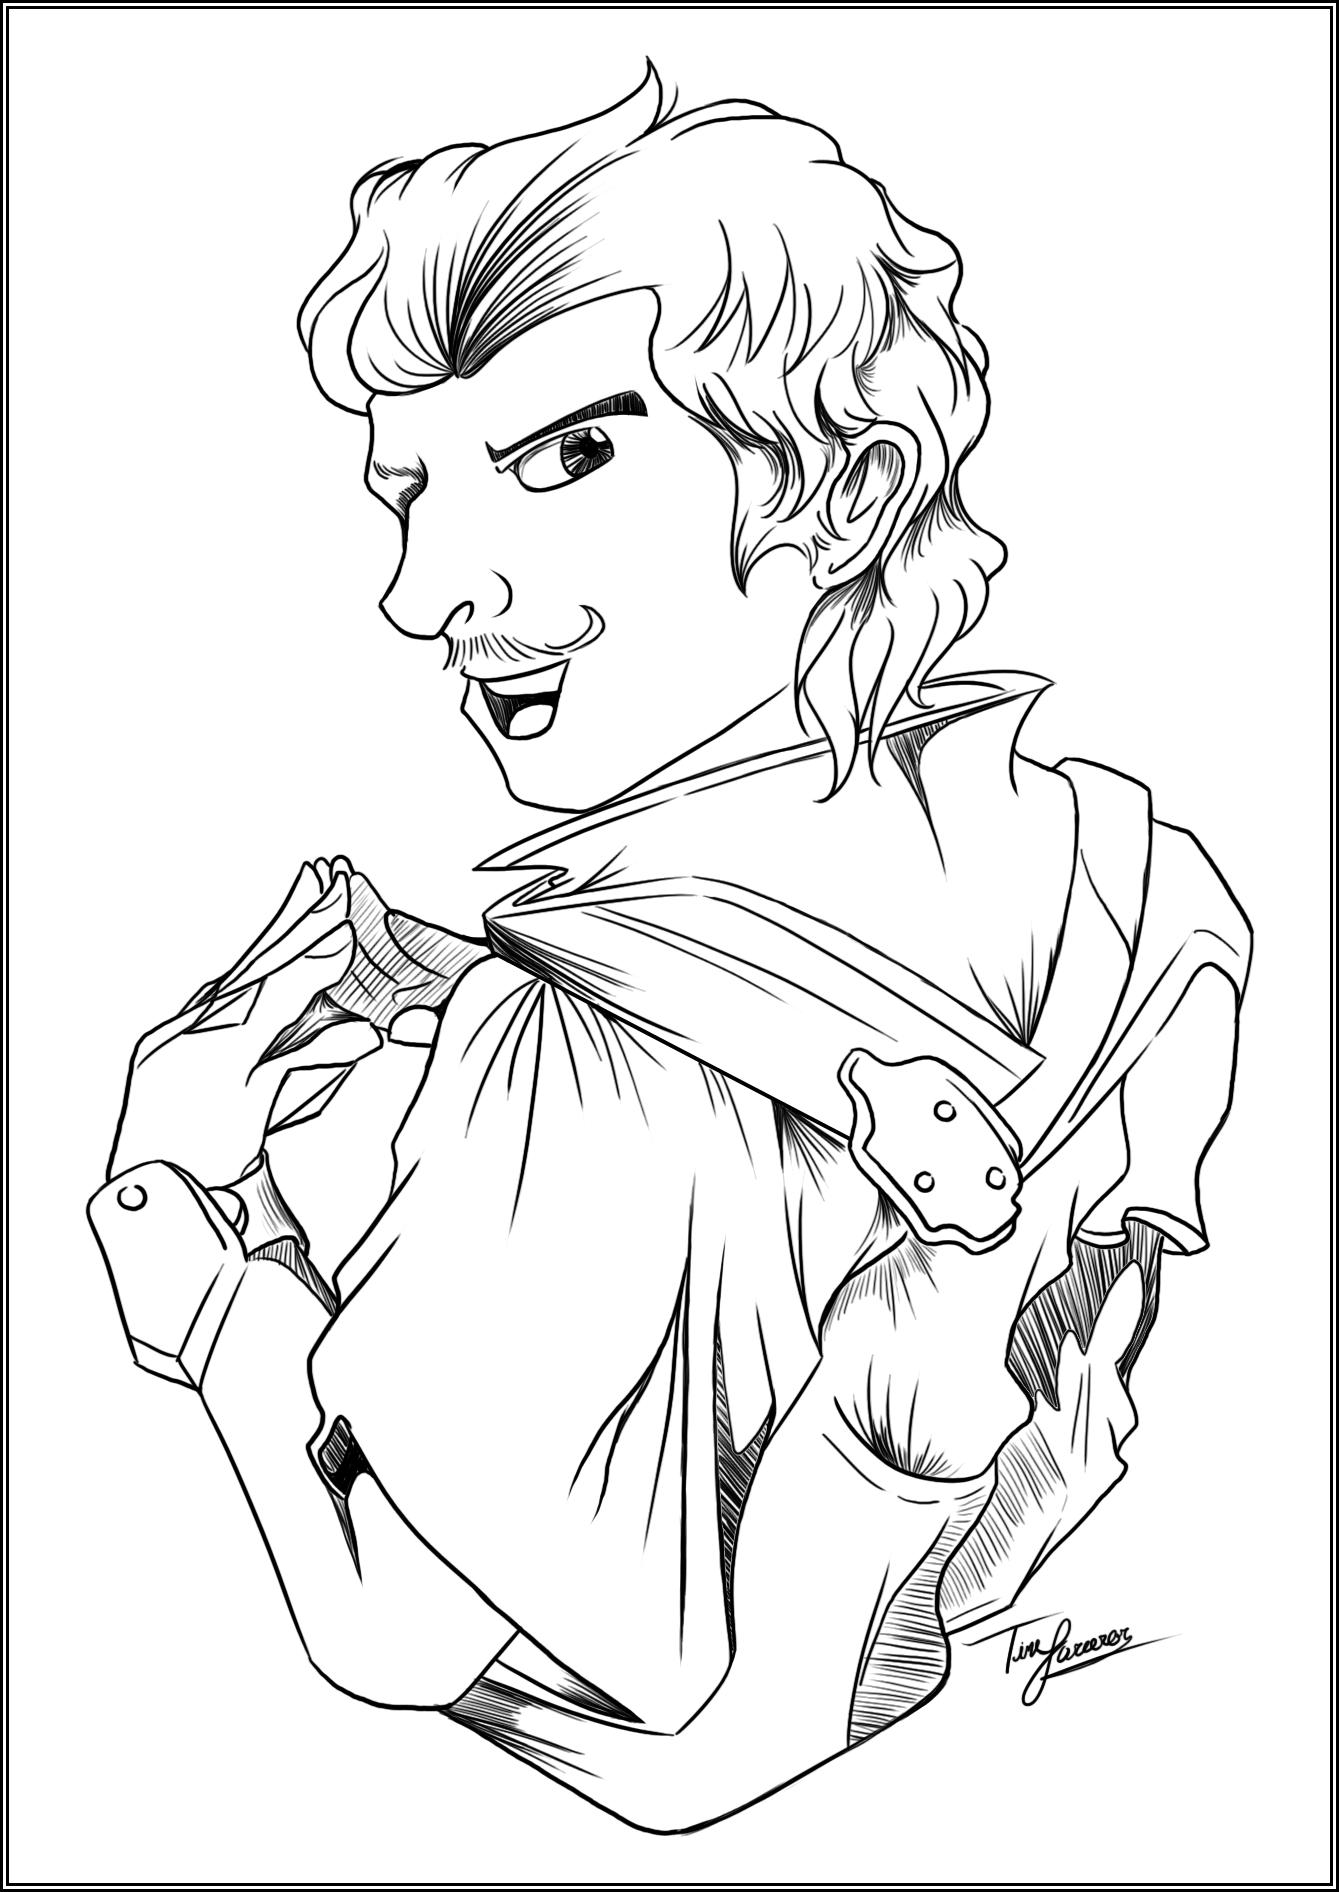 Day 15: Favorite Male Character in DA:I (Dorian Pavus)